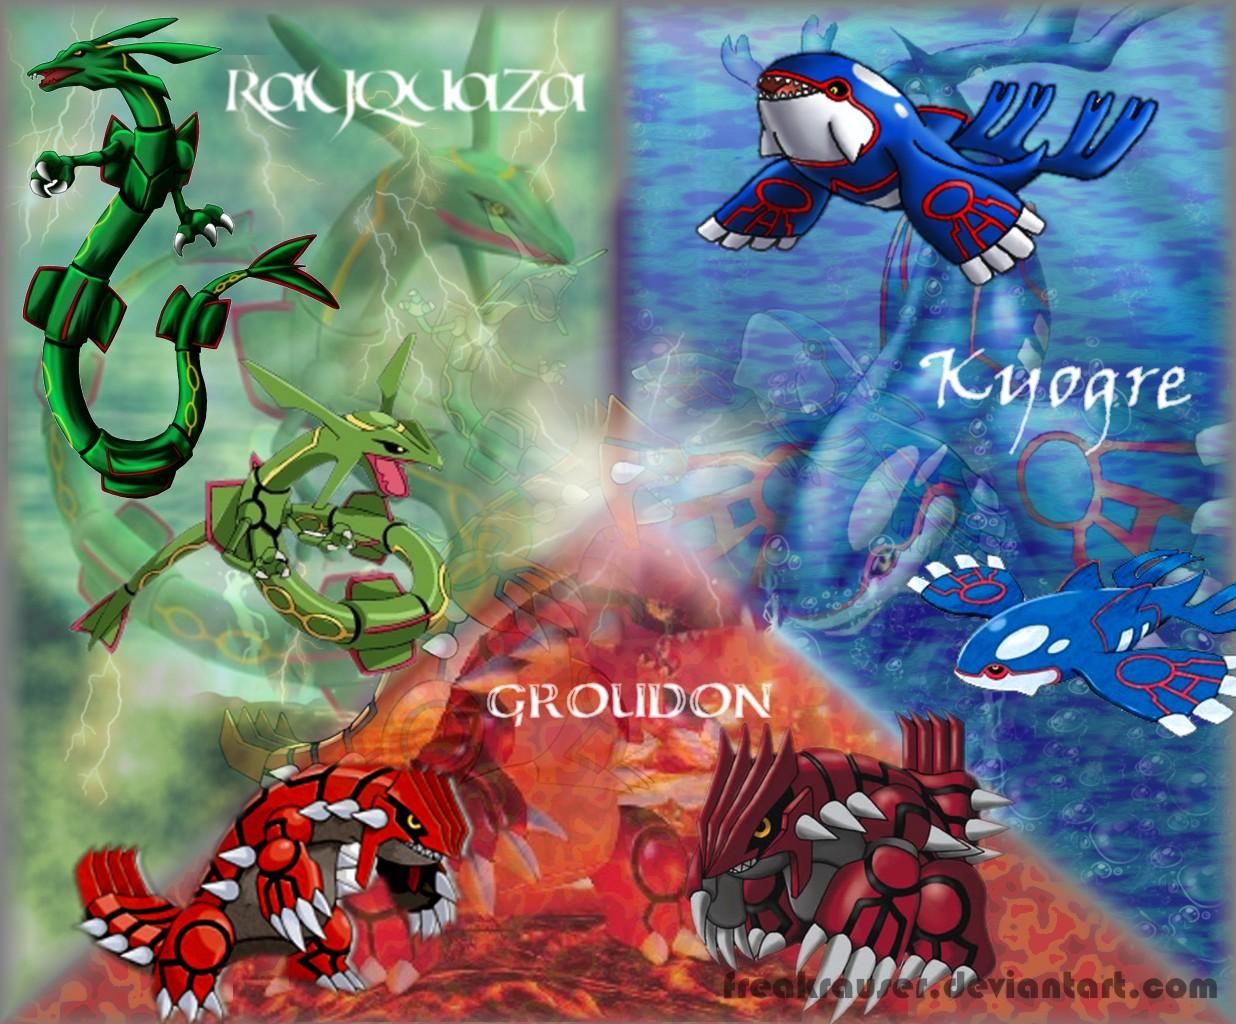 http://4.bp.blogspot.com/-nfEts30vmw0/UAQdymnn81I/AAAAAAAAAFE/FWQ9j8pDn2Q/s1600/pokemon_groudon_kyogre_rayquaza_desktop_1236x1024_hd-wallpaper-502697.jpg